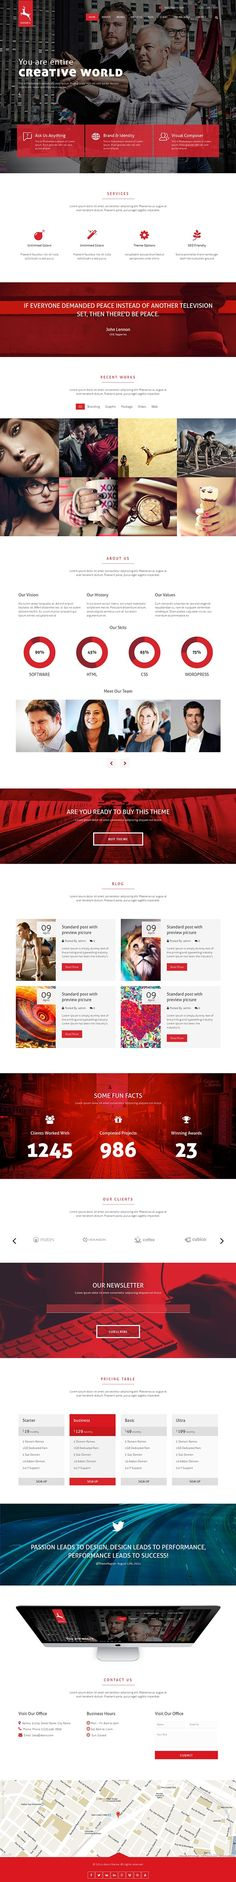 Doors Onepage MultiPurpose WordPress Theme on Behance